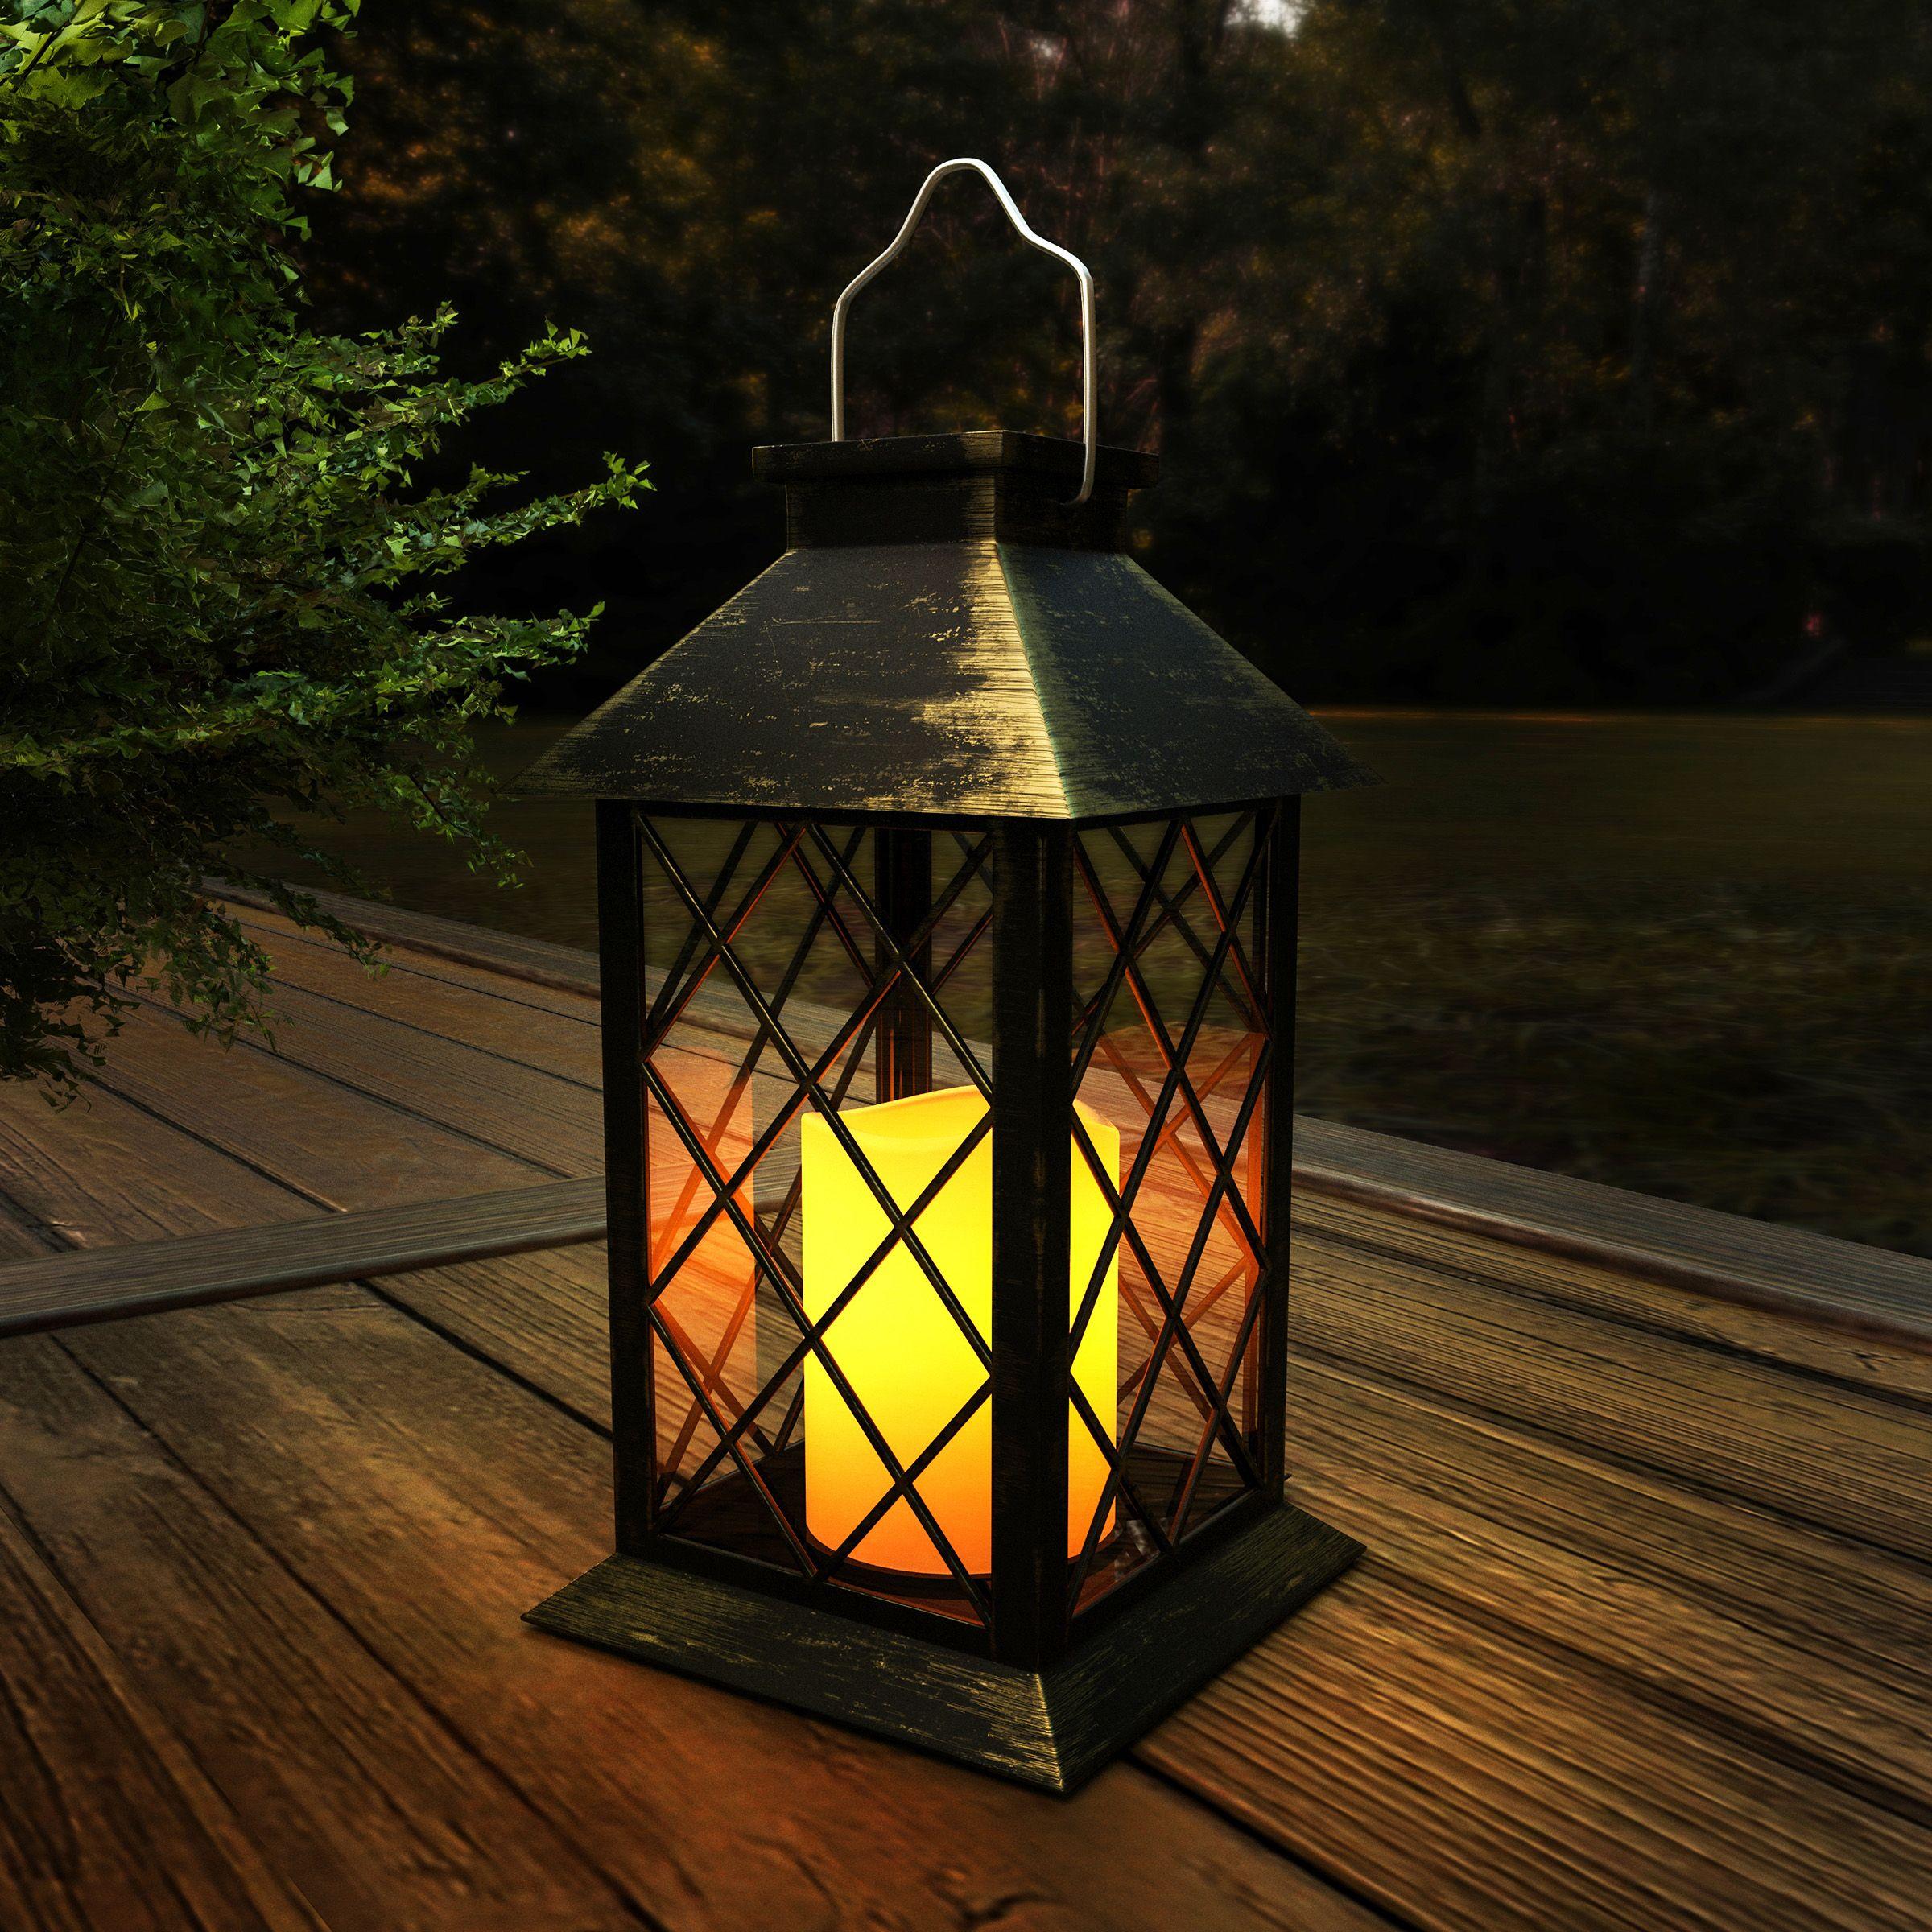 Solar Powered Lantern Hanging Or Tabletop Water Resistant Led Pillar In 2020 Solar Powered Lanterns Lavish Home Led Pillar Candle